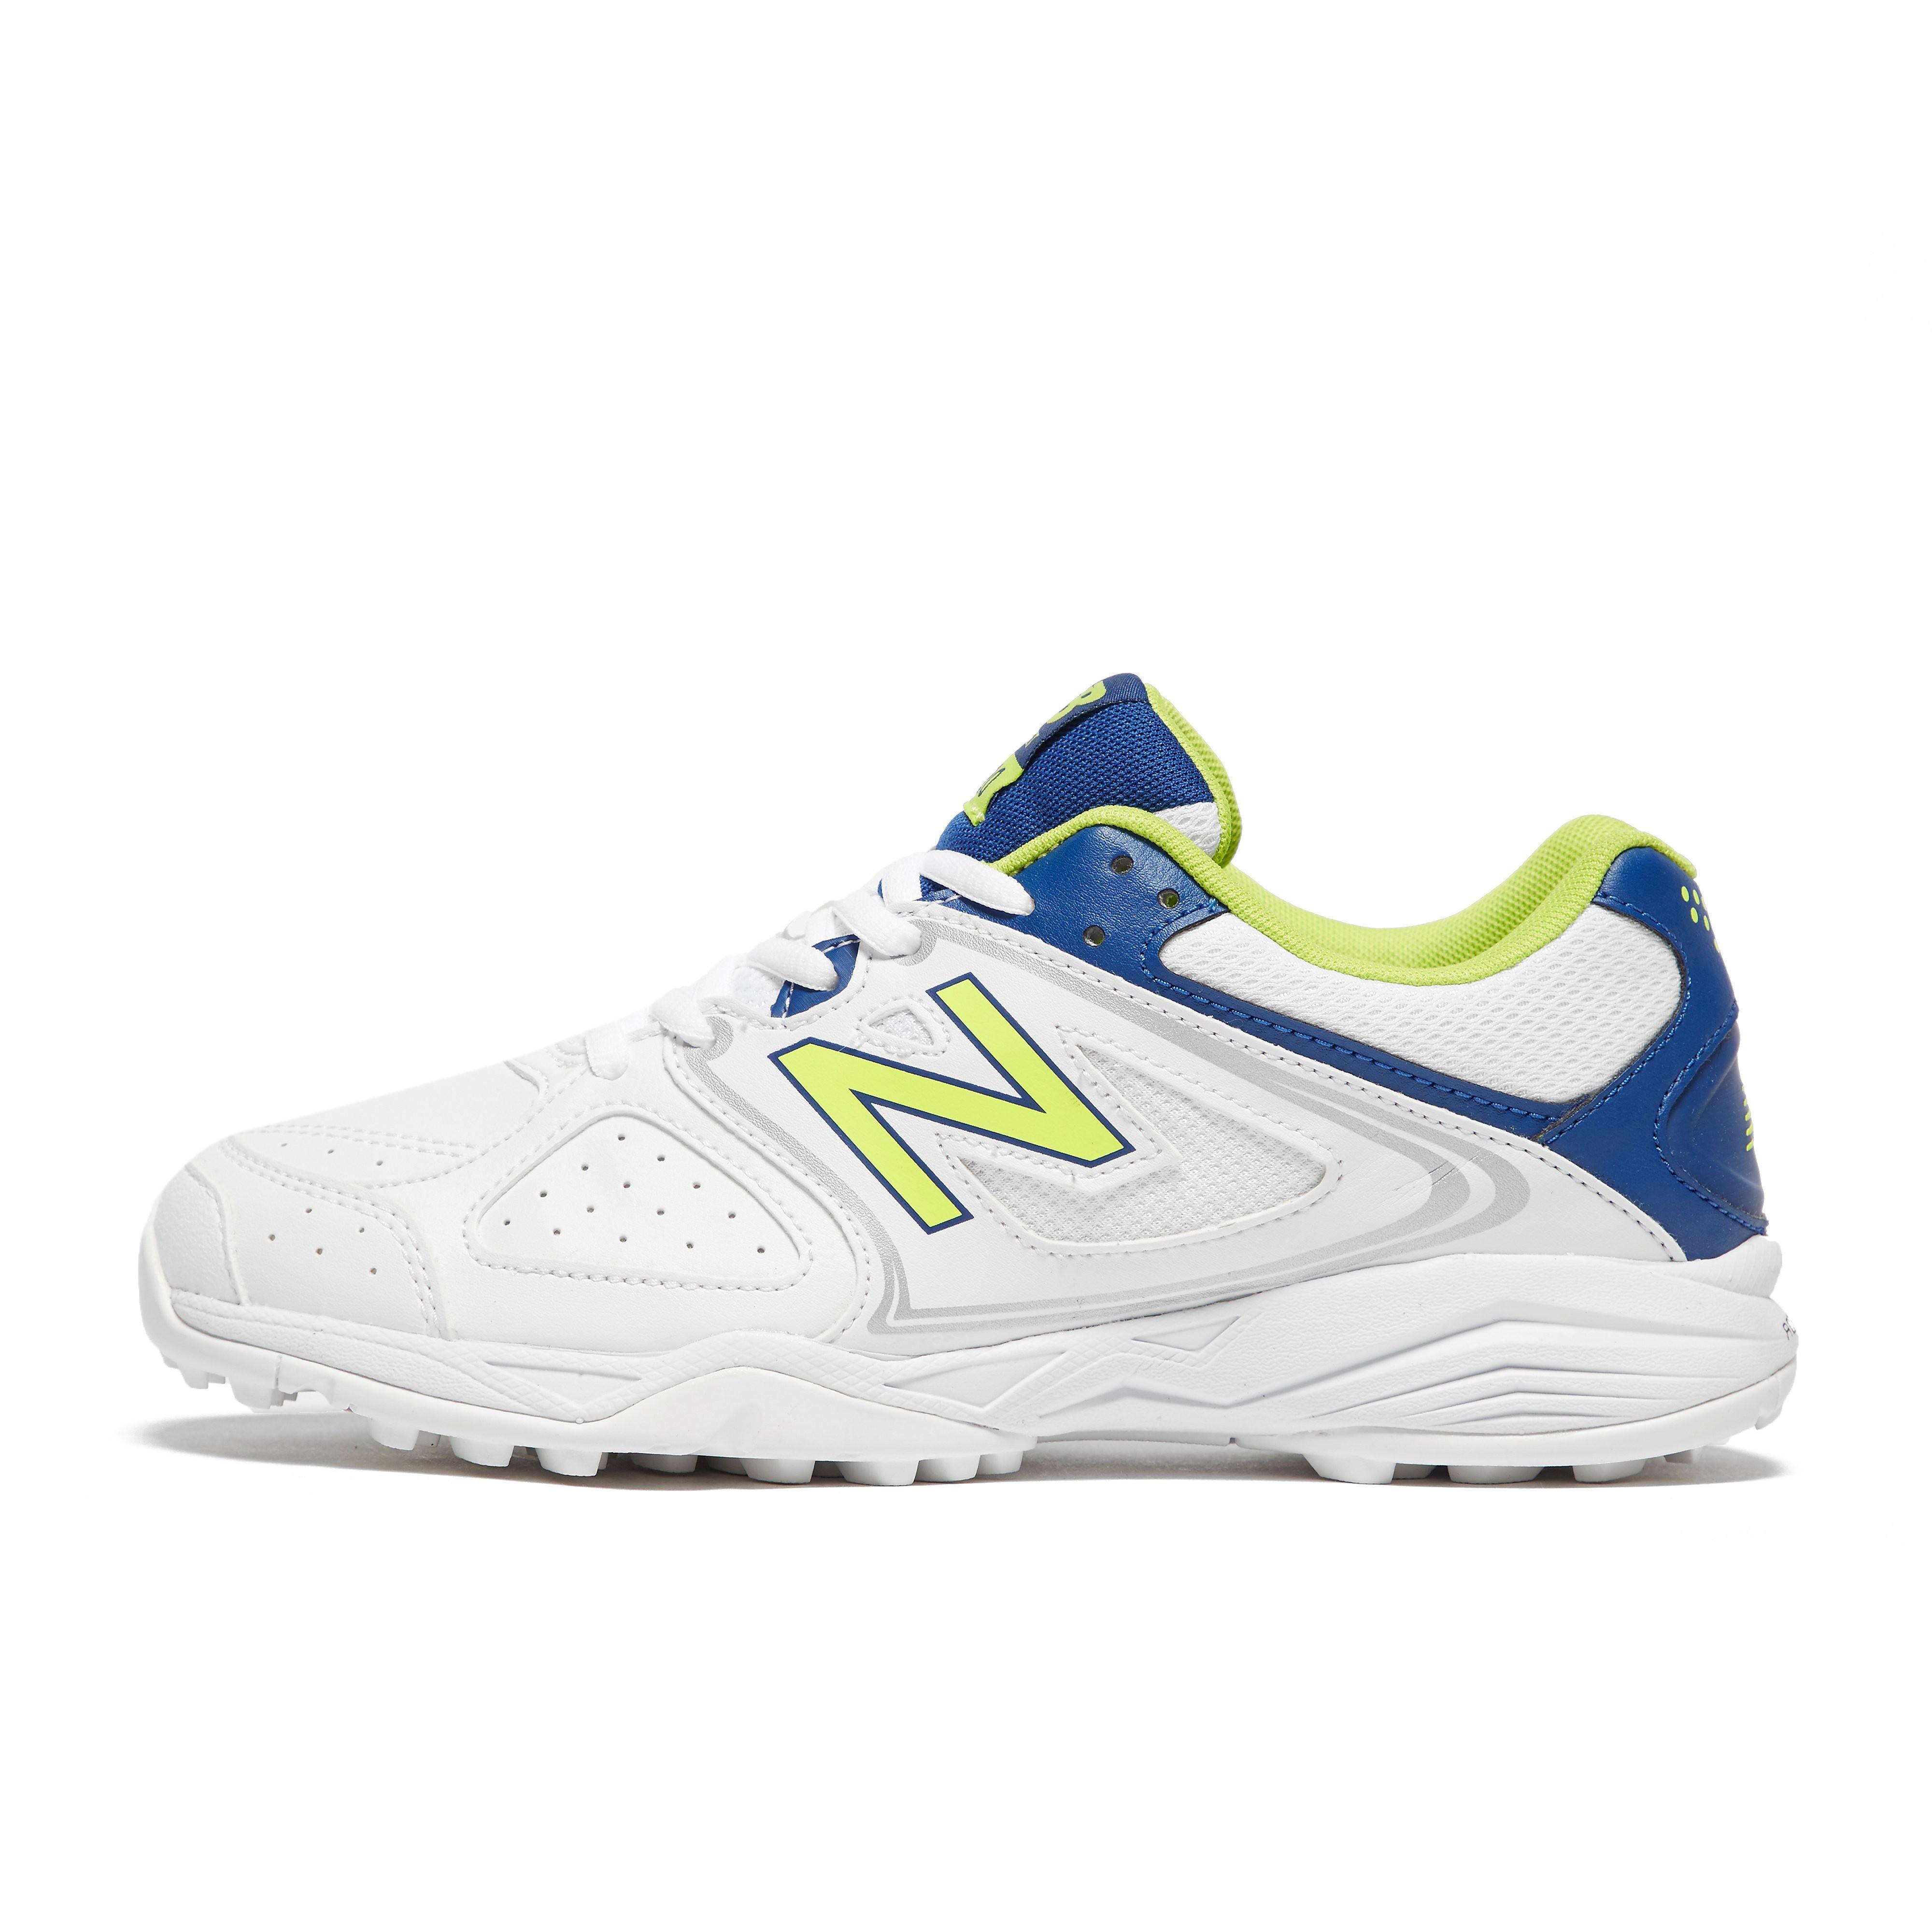 New Balance CK4020 Junior Cricket Shoes